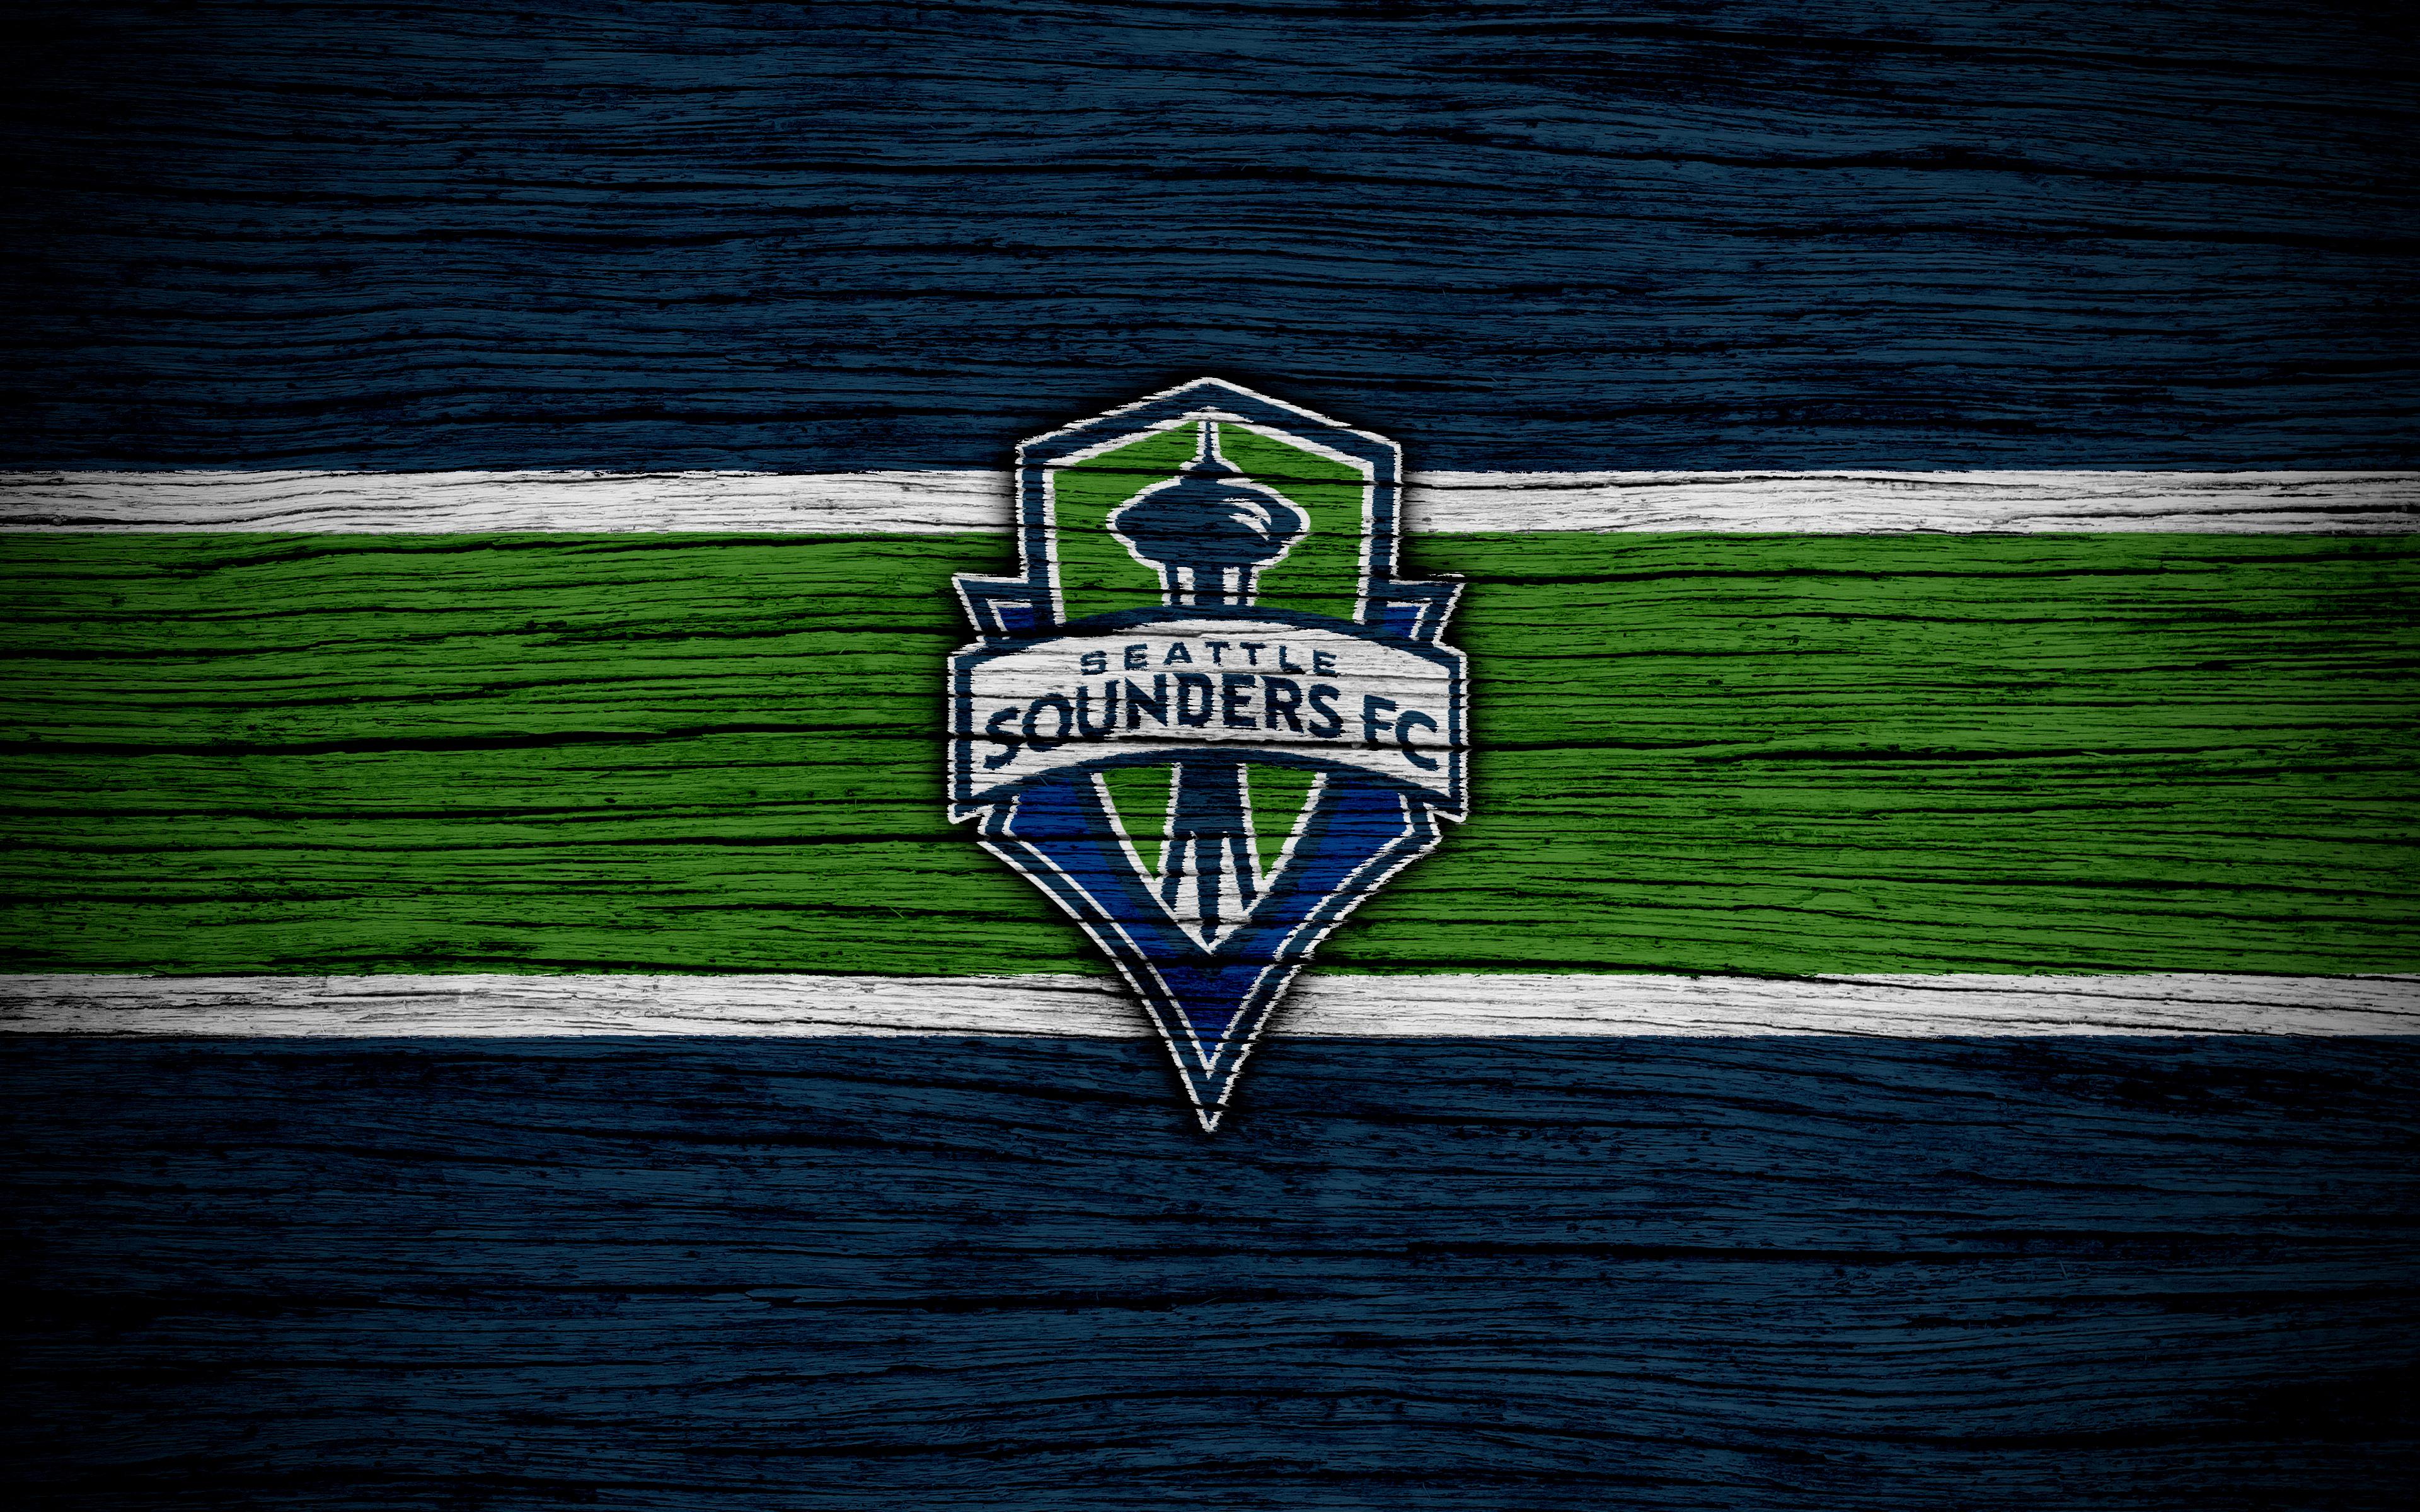 Seattle Sounders Fc 4k Ultra Hd Wallpaper Background Image 3840x2400 Id 989002 Wallpaper Abyss